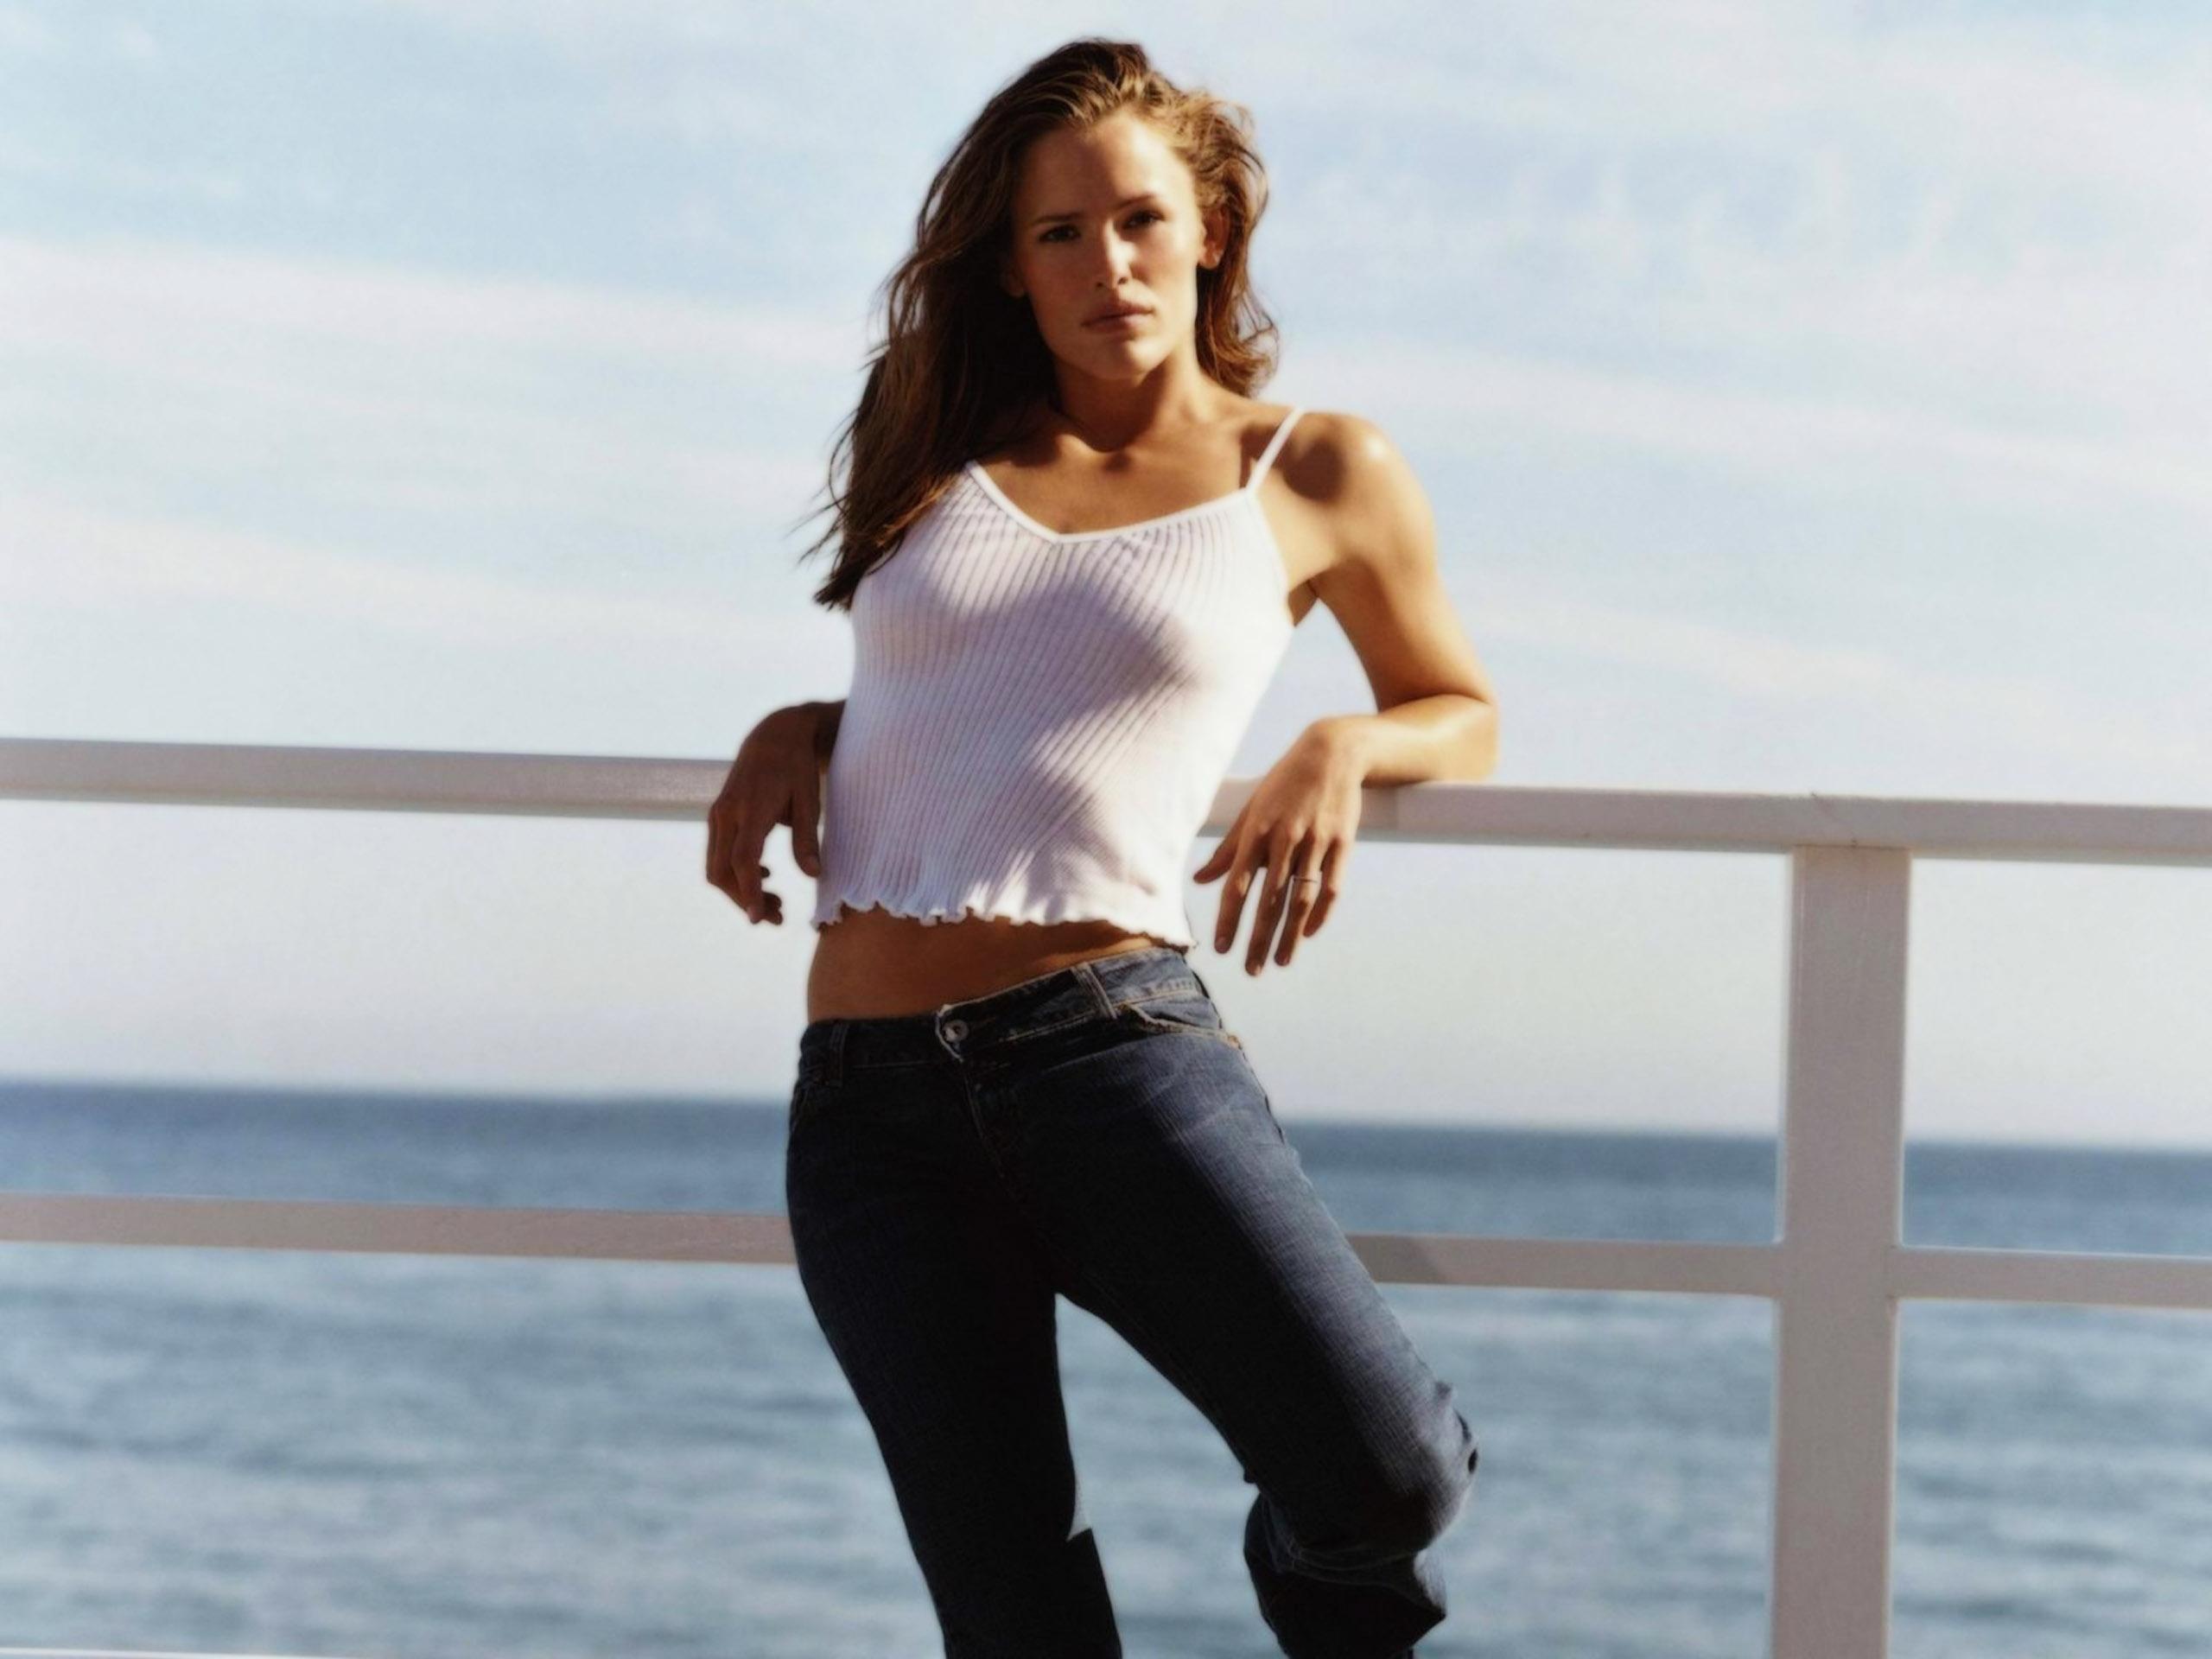 Jennifer garner wallpaper bikini